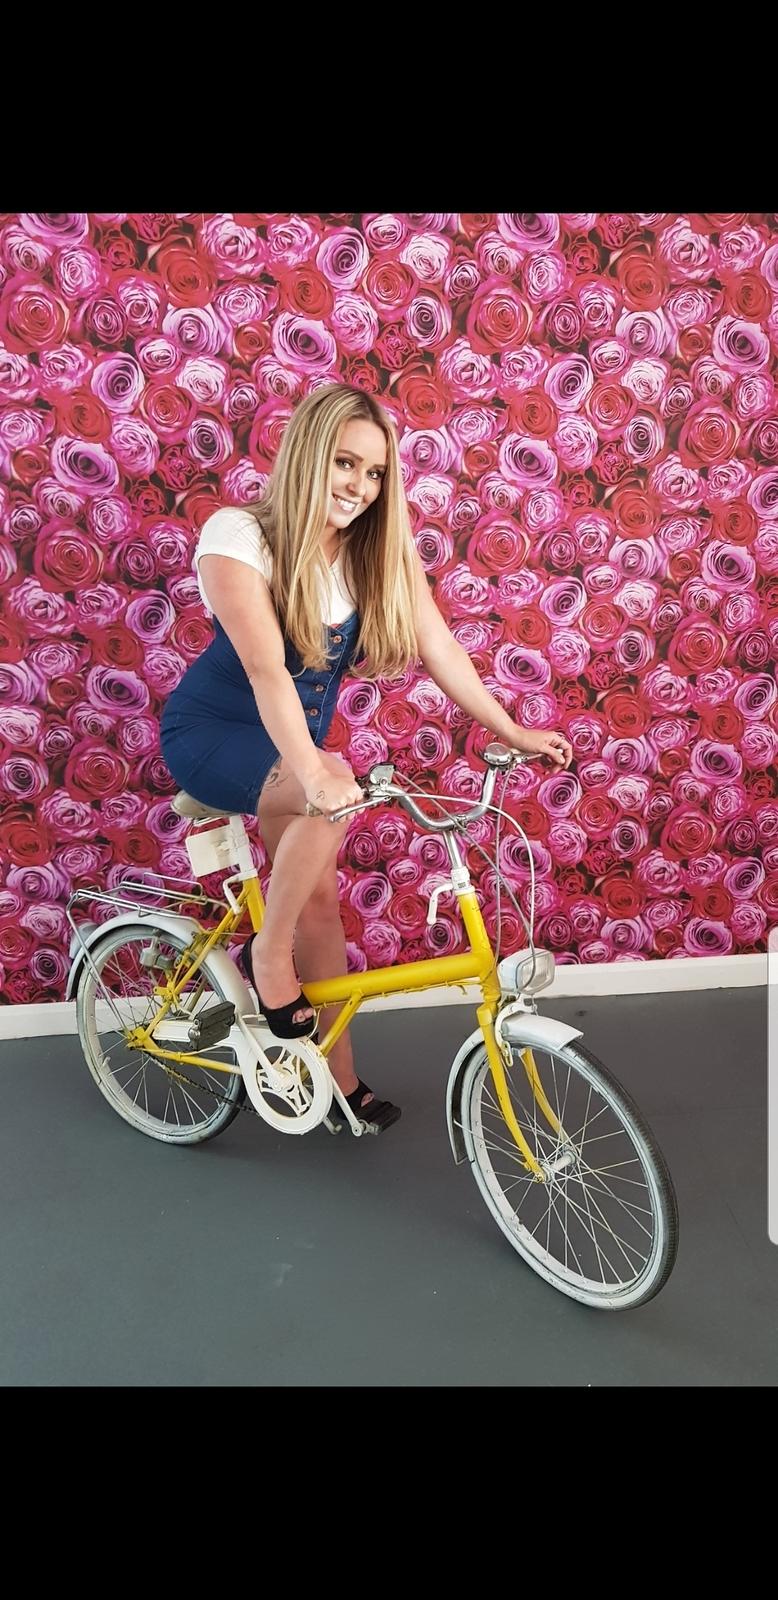 Bike ride / Model Clairesavannah / Uploaded 8th June 2019 @ 06:29 PM